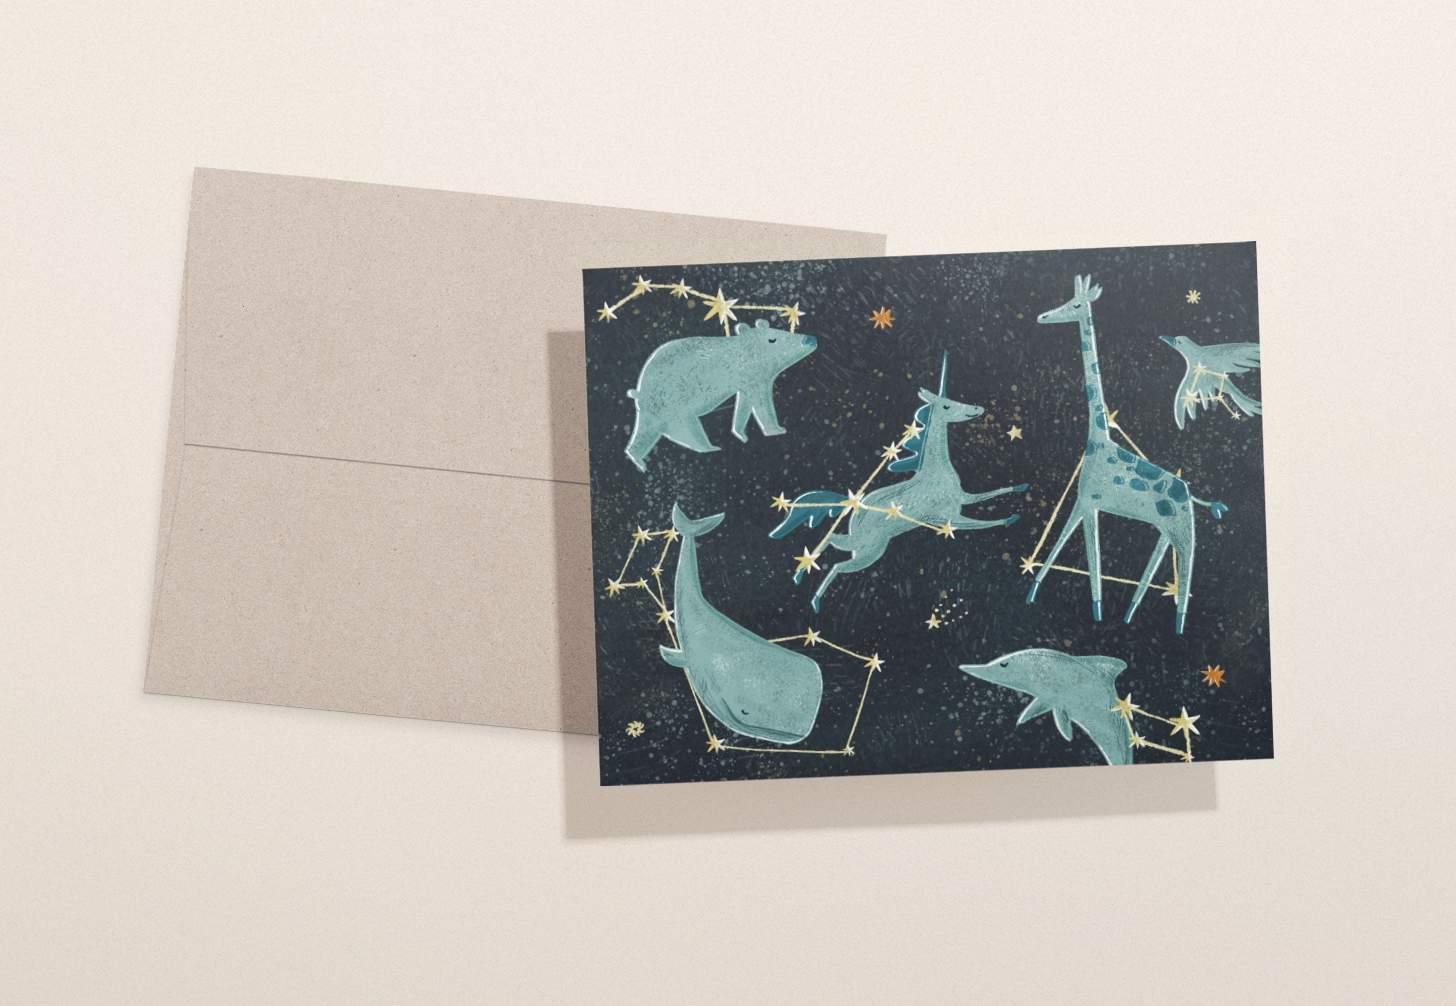 Blue animal constellation design with brown envelope